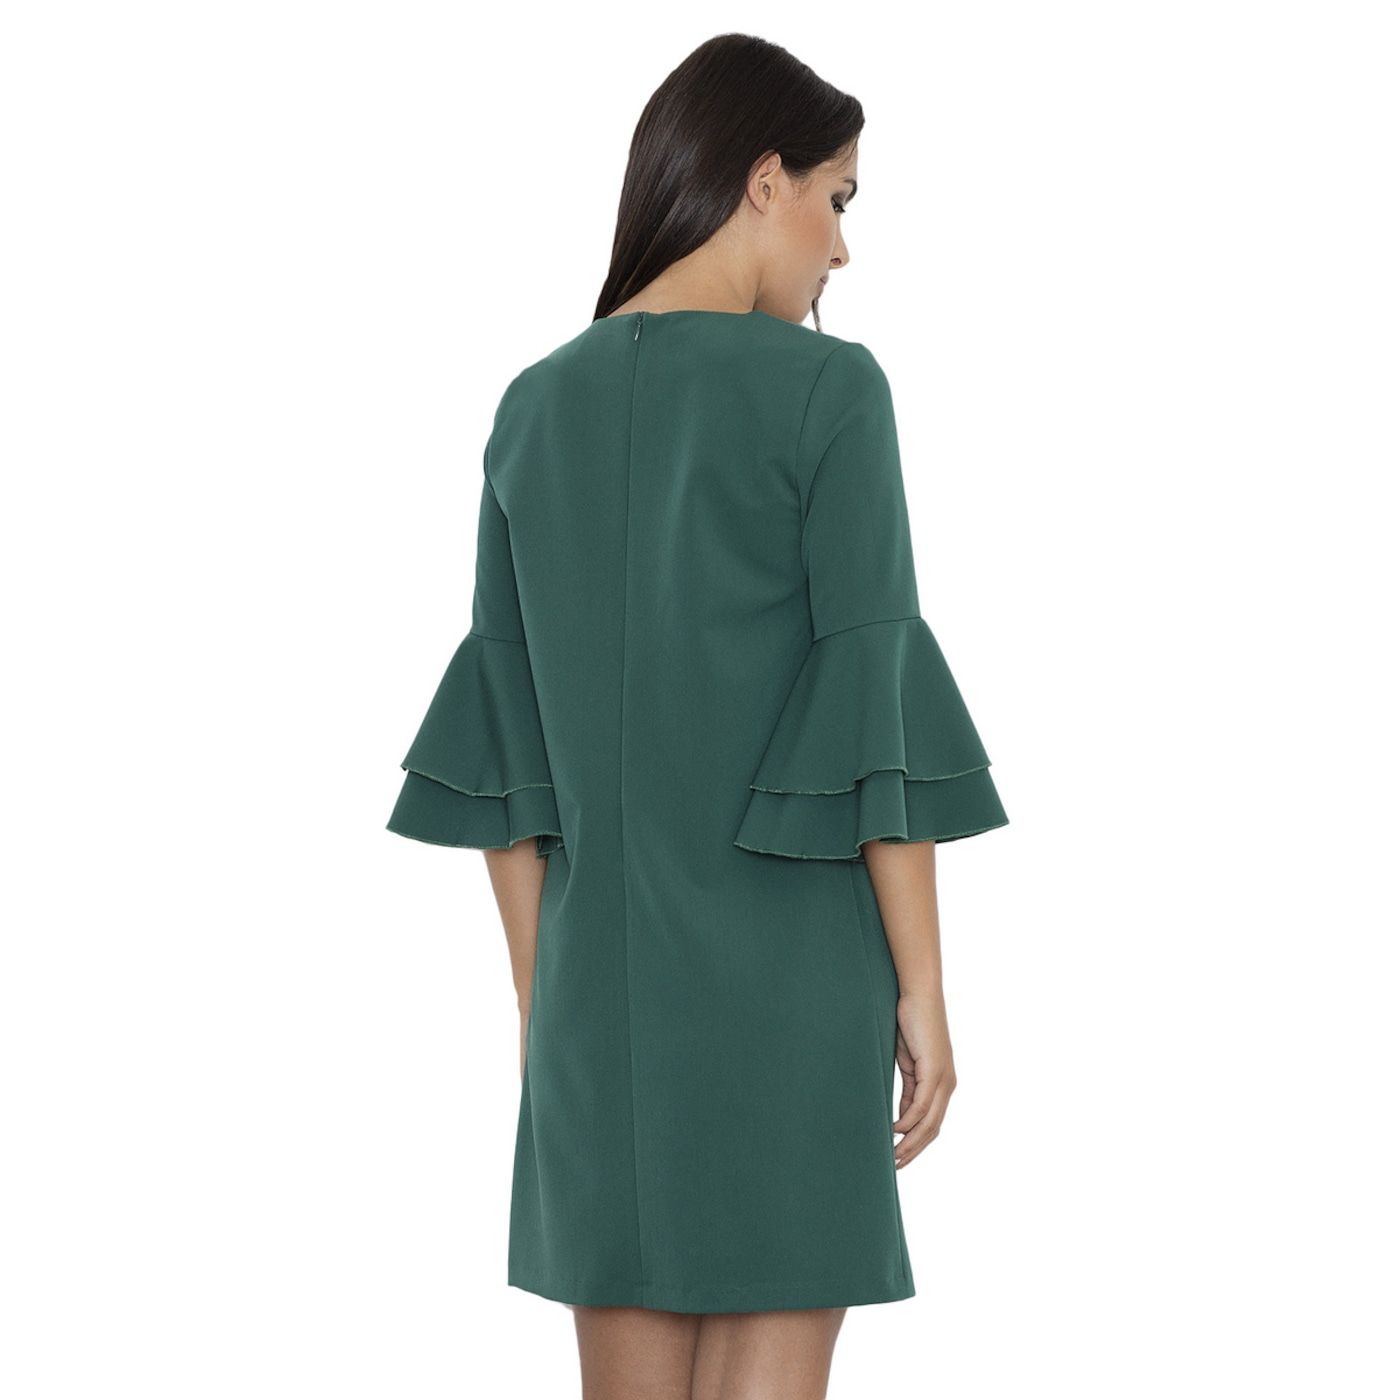 Figl Womans Dress M564 dámské Green XL